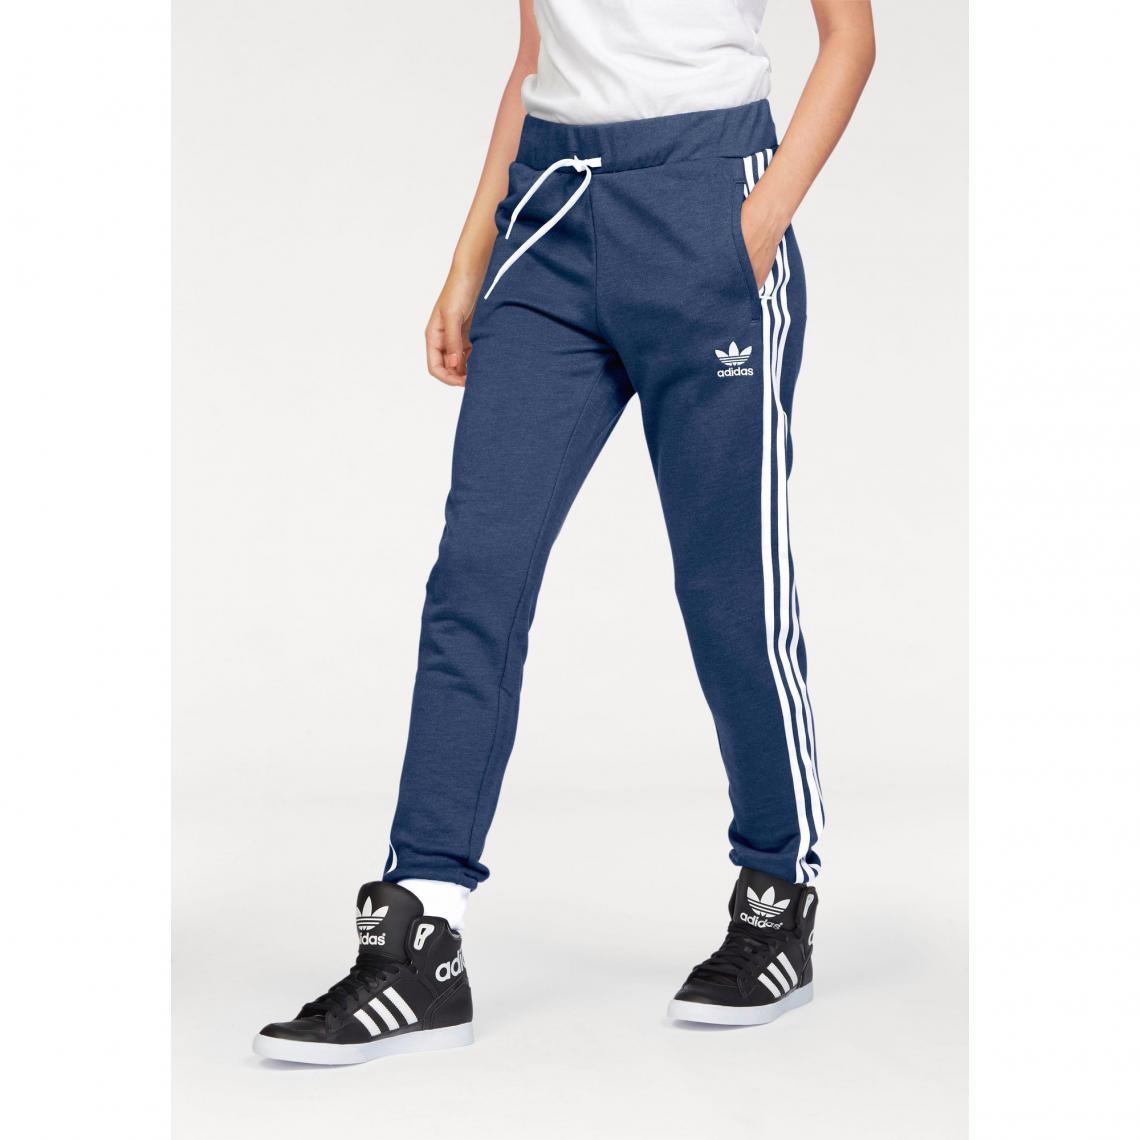 Pantalon de survêtement homme adidas Originals - Bleu Adidas Originals Femme 62c7af3fc09